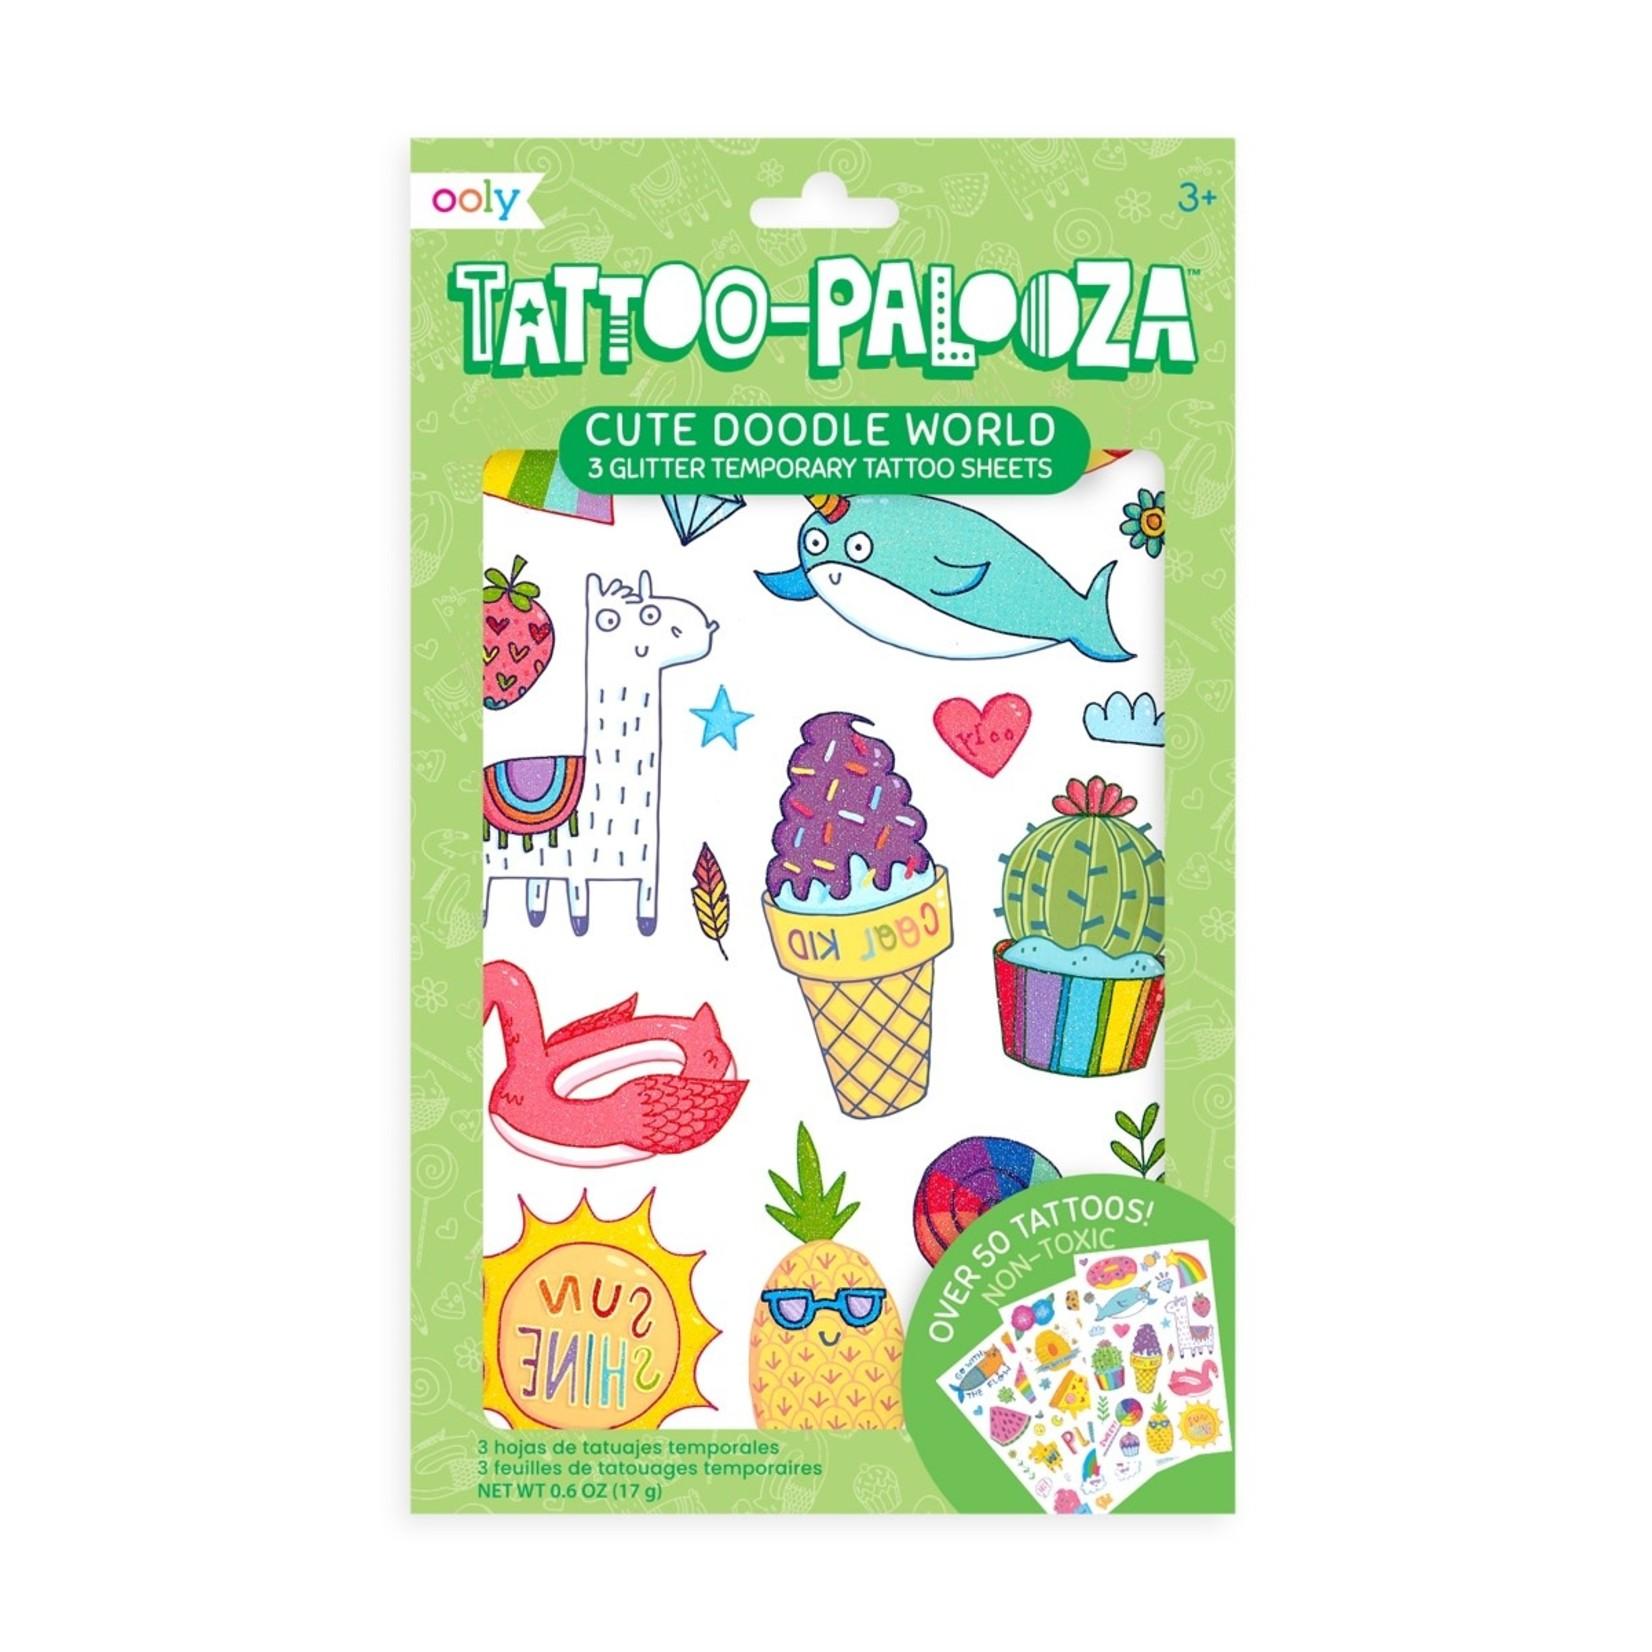 Ooly Tattoo Palooza Temporary Tattoo: Cute Doodle World